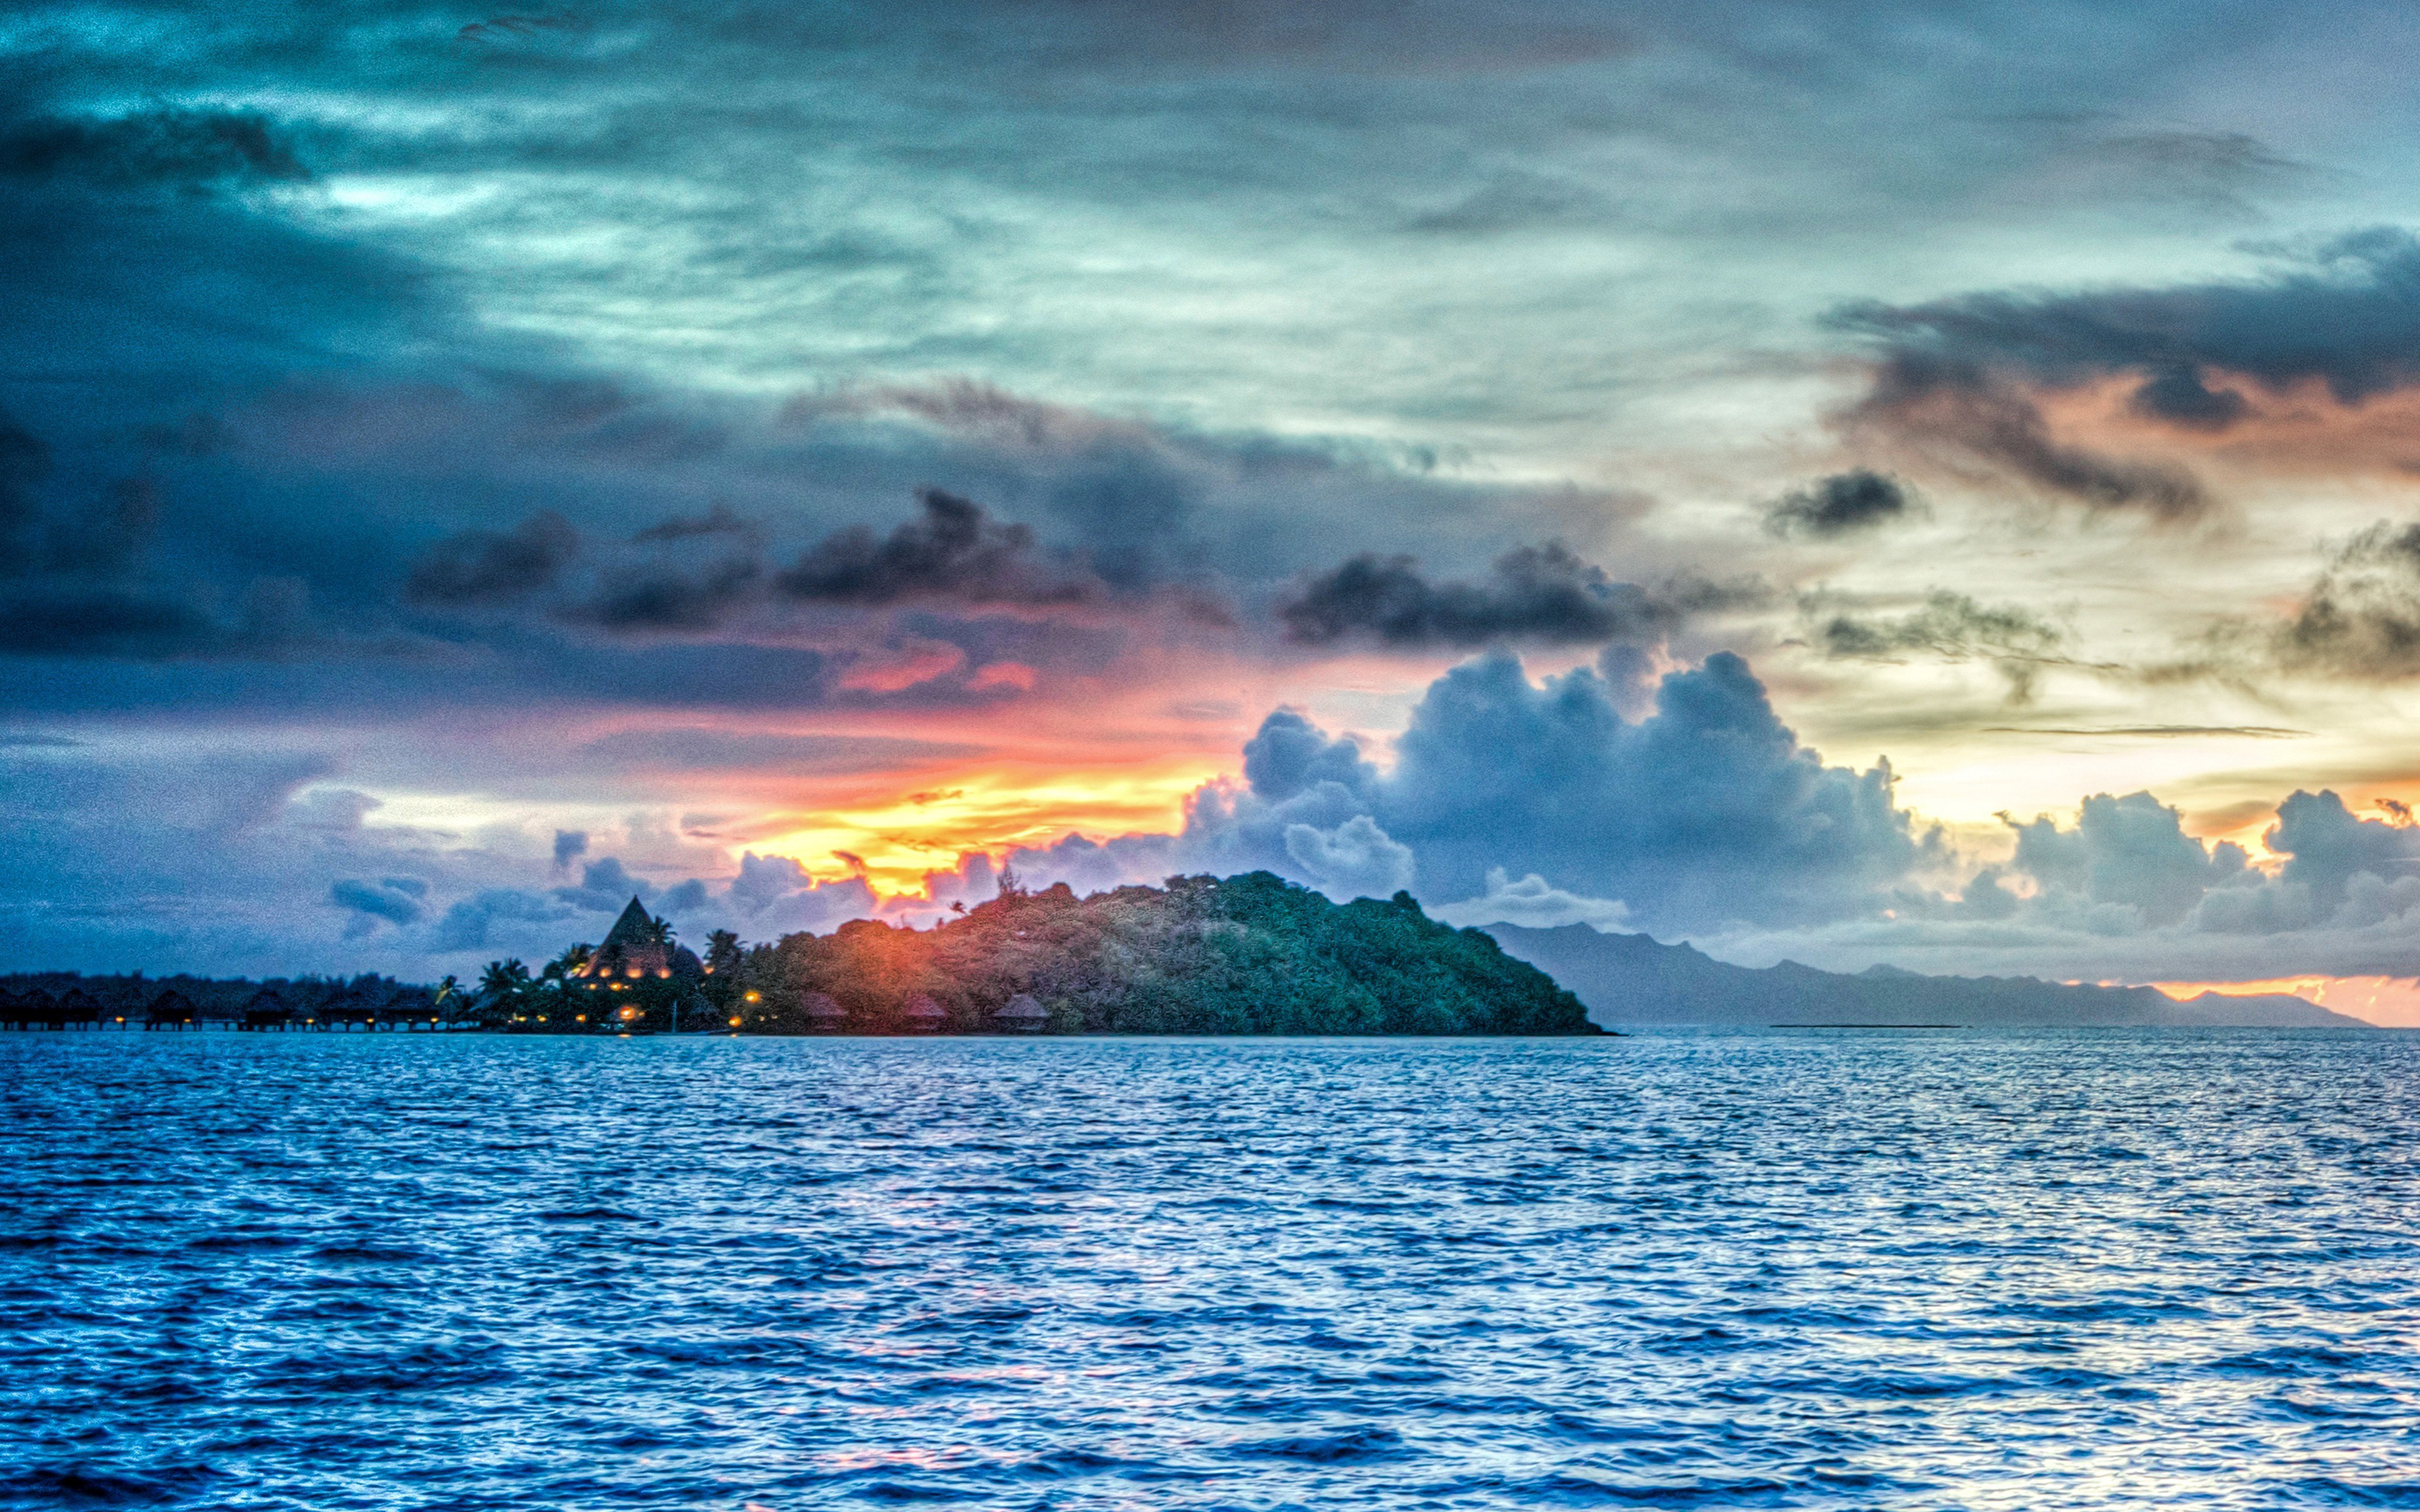 nr34-borabora-sea-island-sunset-summer-nature-wallpaper